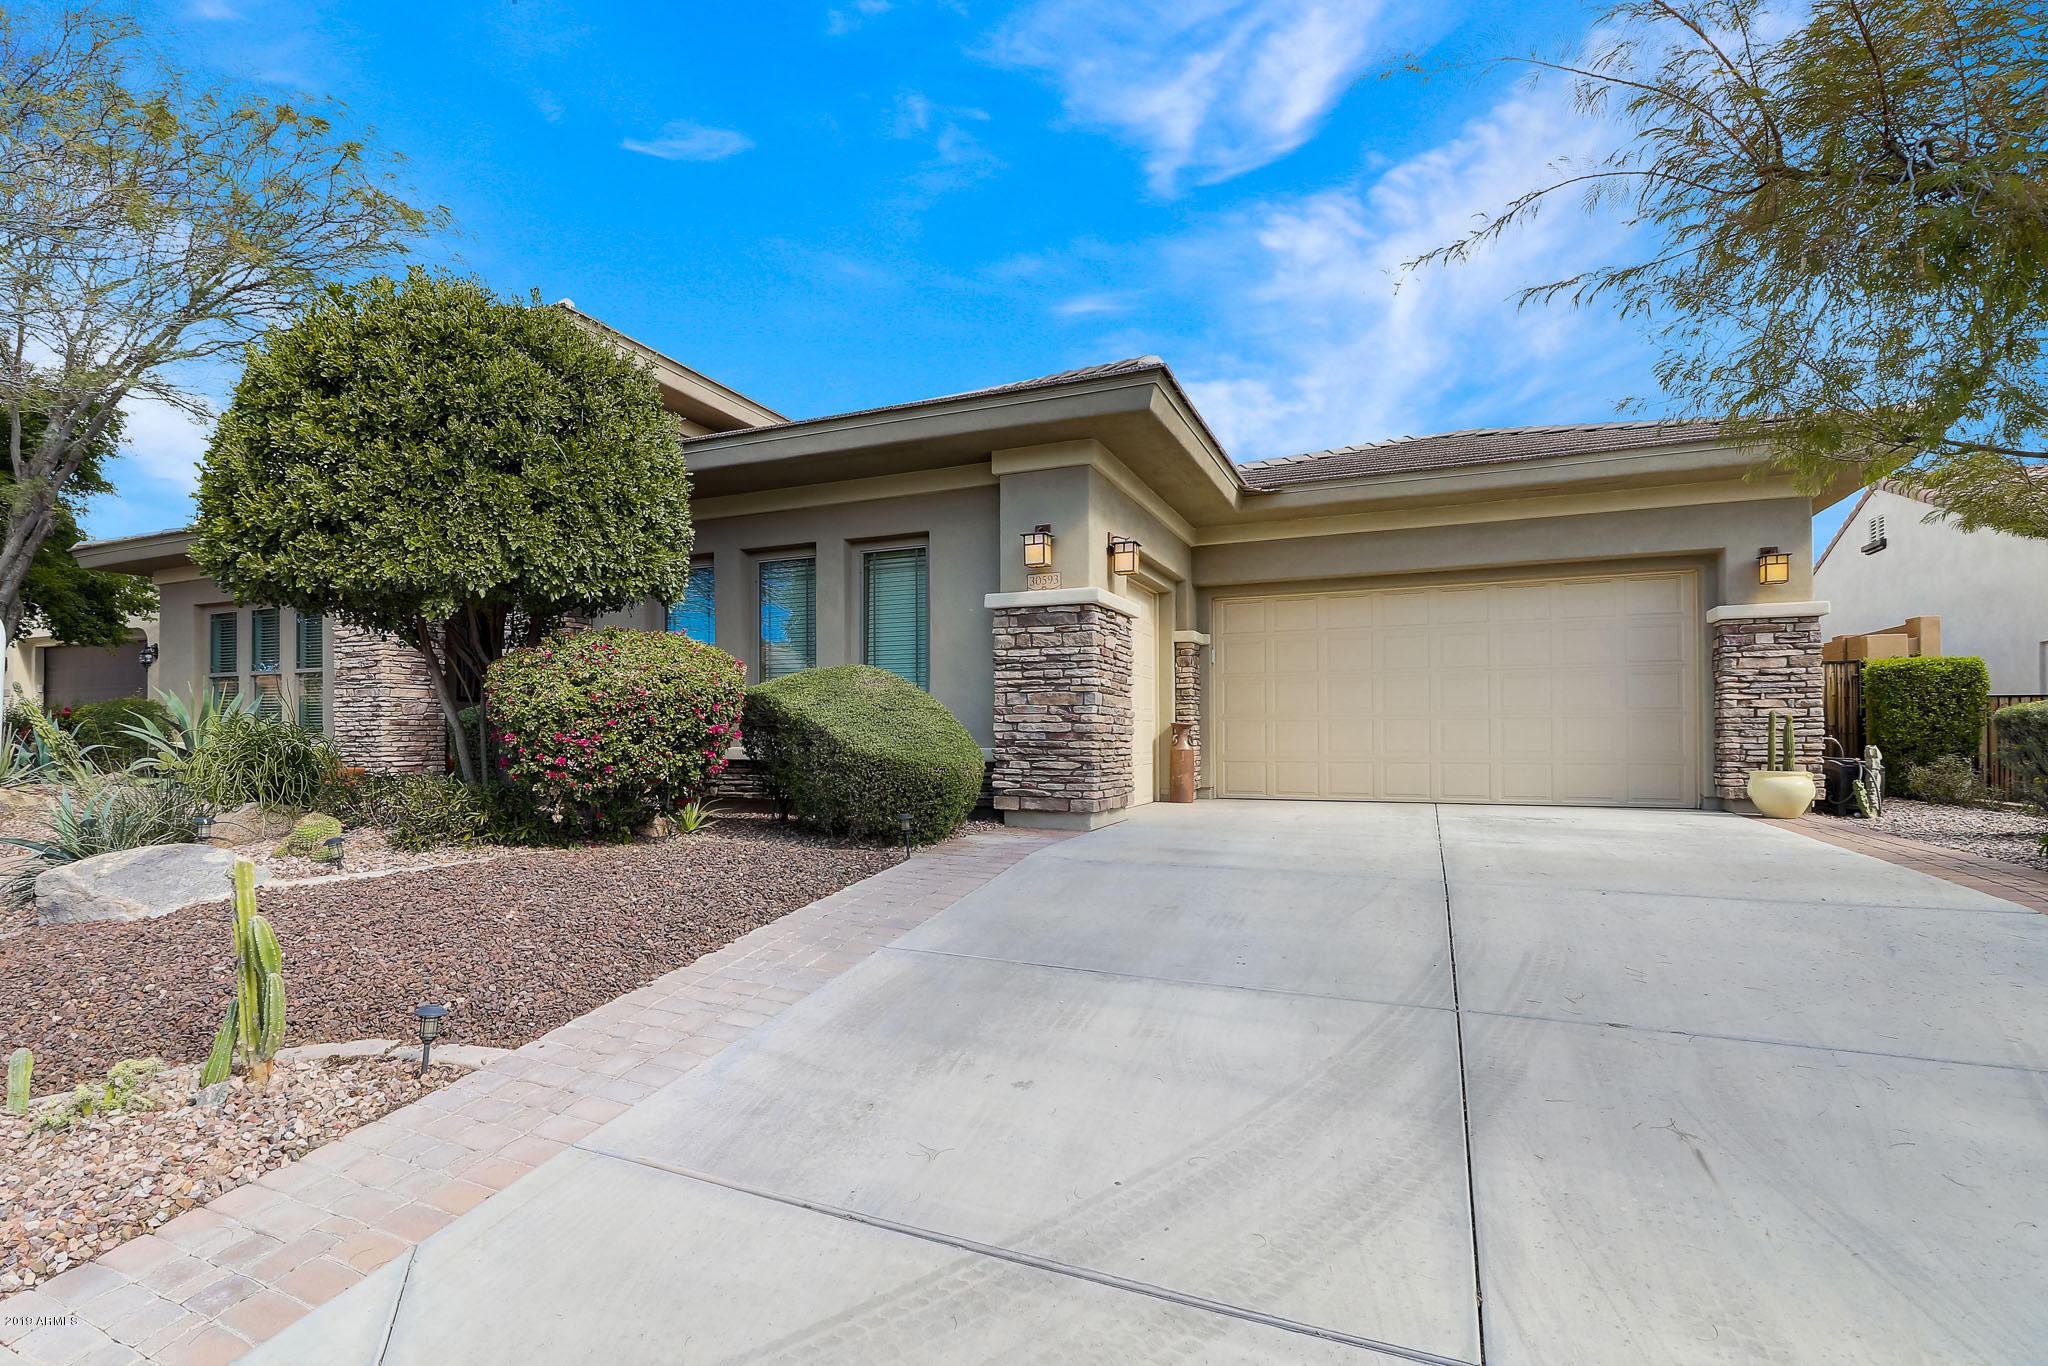 30593 N 126TH Lane, Vistancia in Maricopa County, AZ 85383 Home for Sale